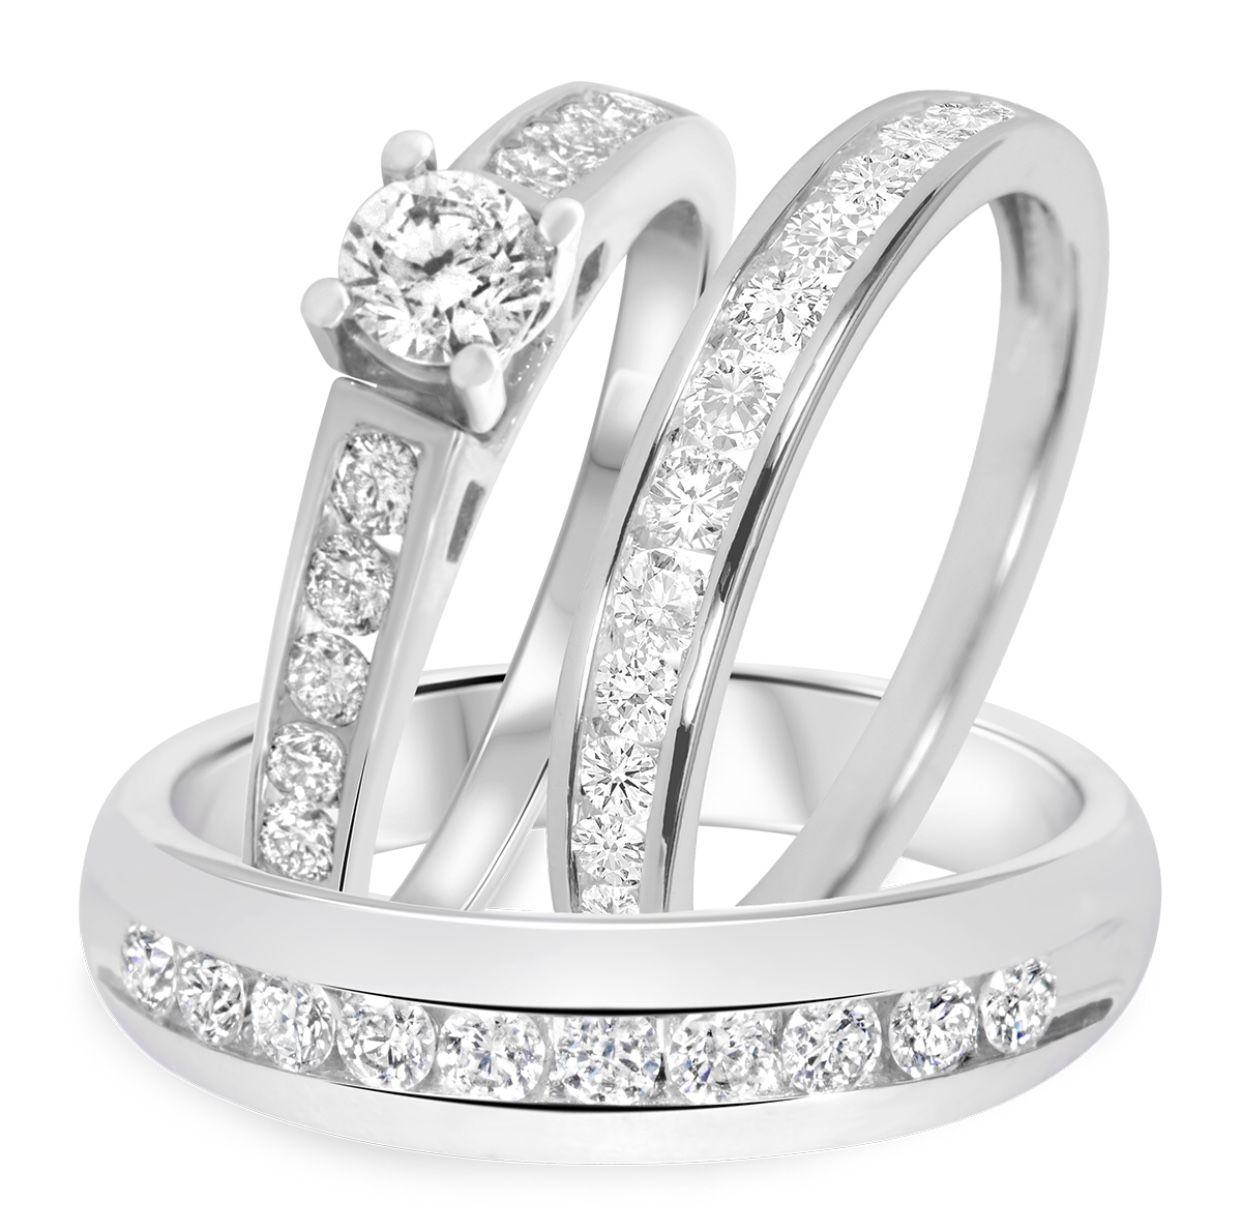 Pin by Trav & Chlo on Wedding Ideas Matching wedding